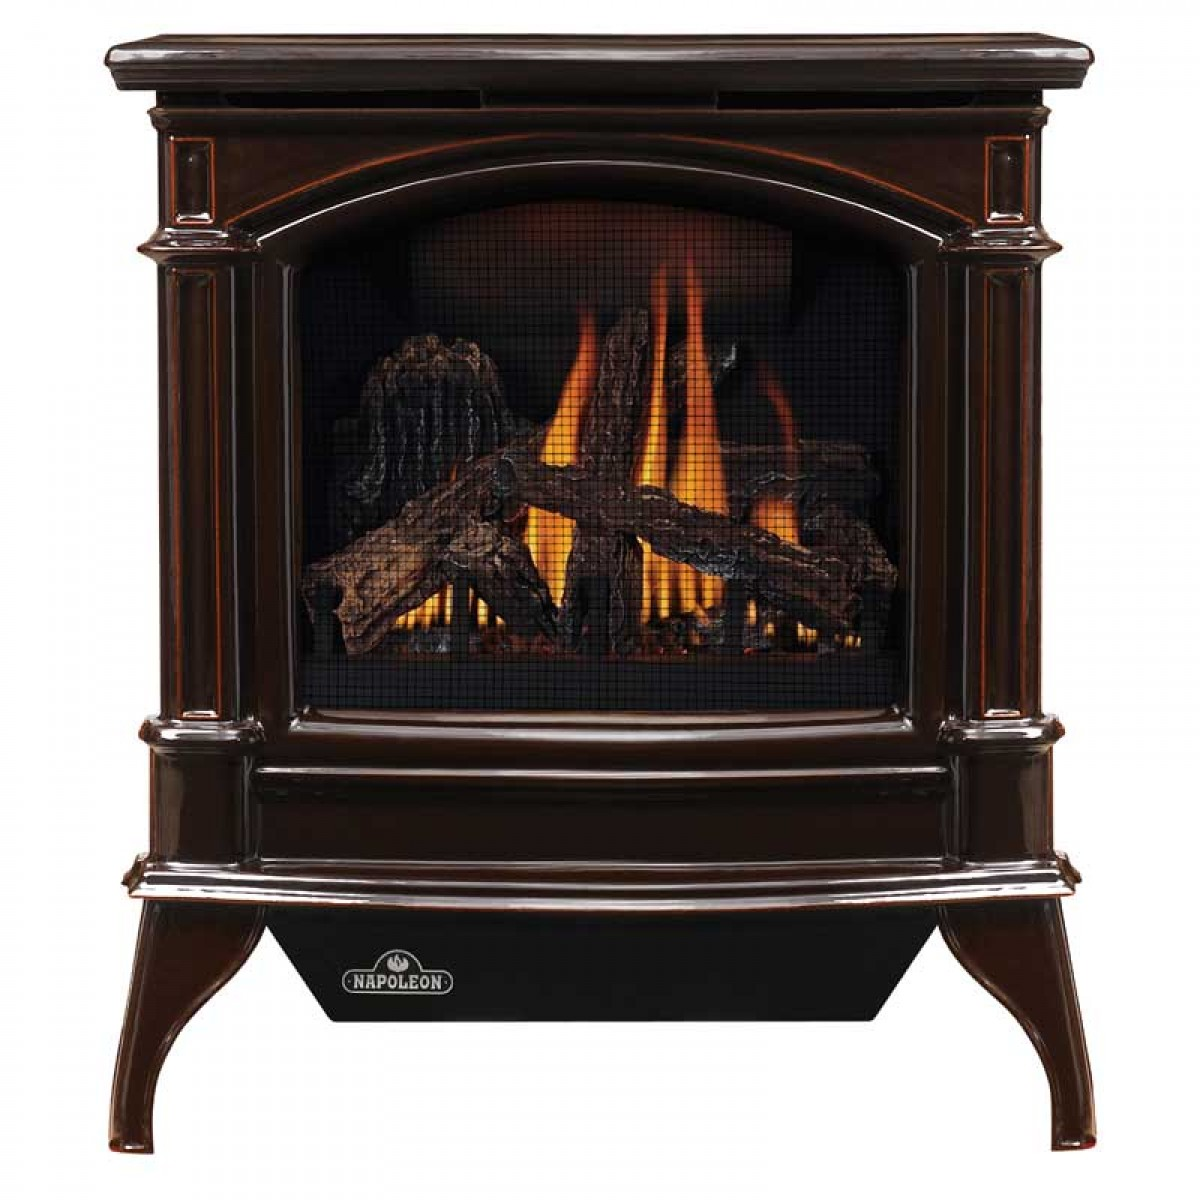 Wood Vs Coal Btu ~ Napoleon knightsbridge vent free cast iron gas stove